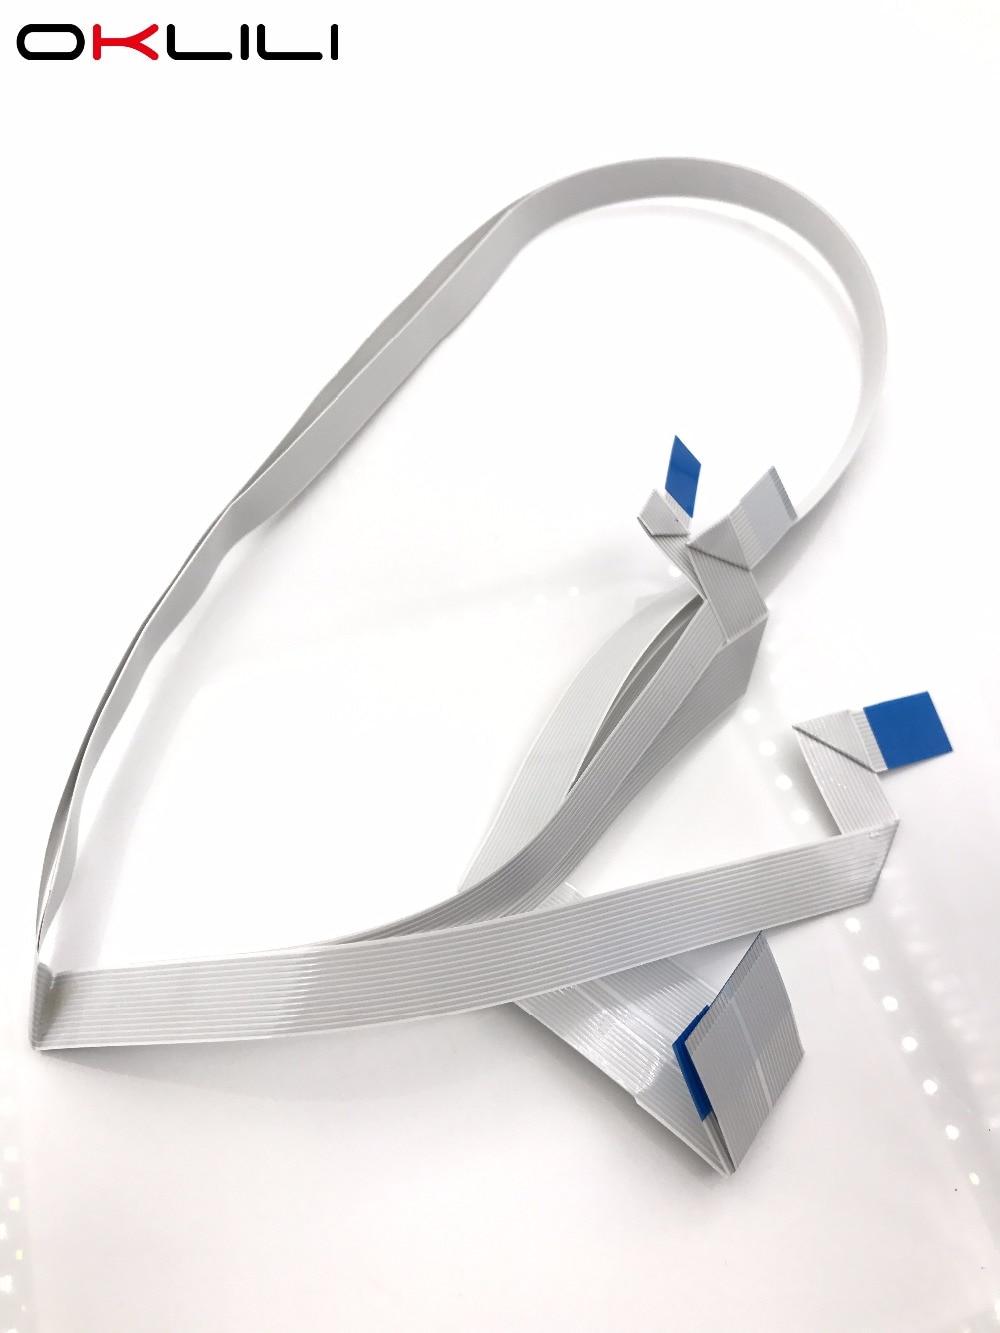 1PCX печатающая головка, кабель печатающей головки для принтера Epson 1390 1400 1410 1430 R260 R360 R380 R390 RX580 RX590 L1800 1500 Вт EP4004